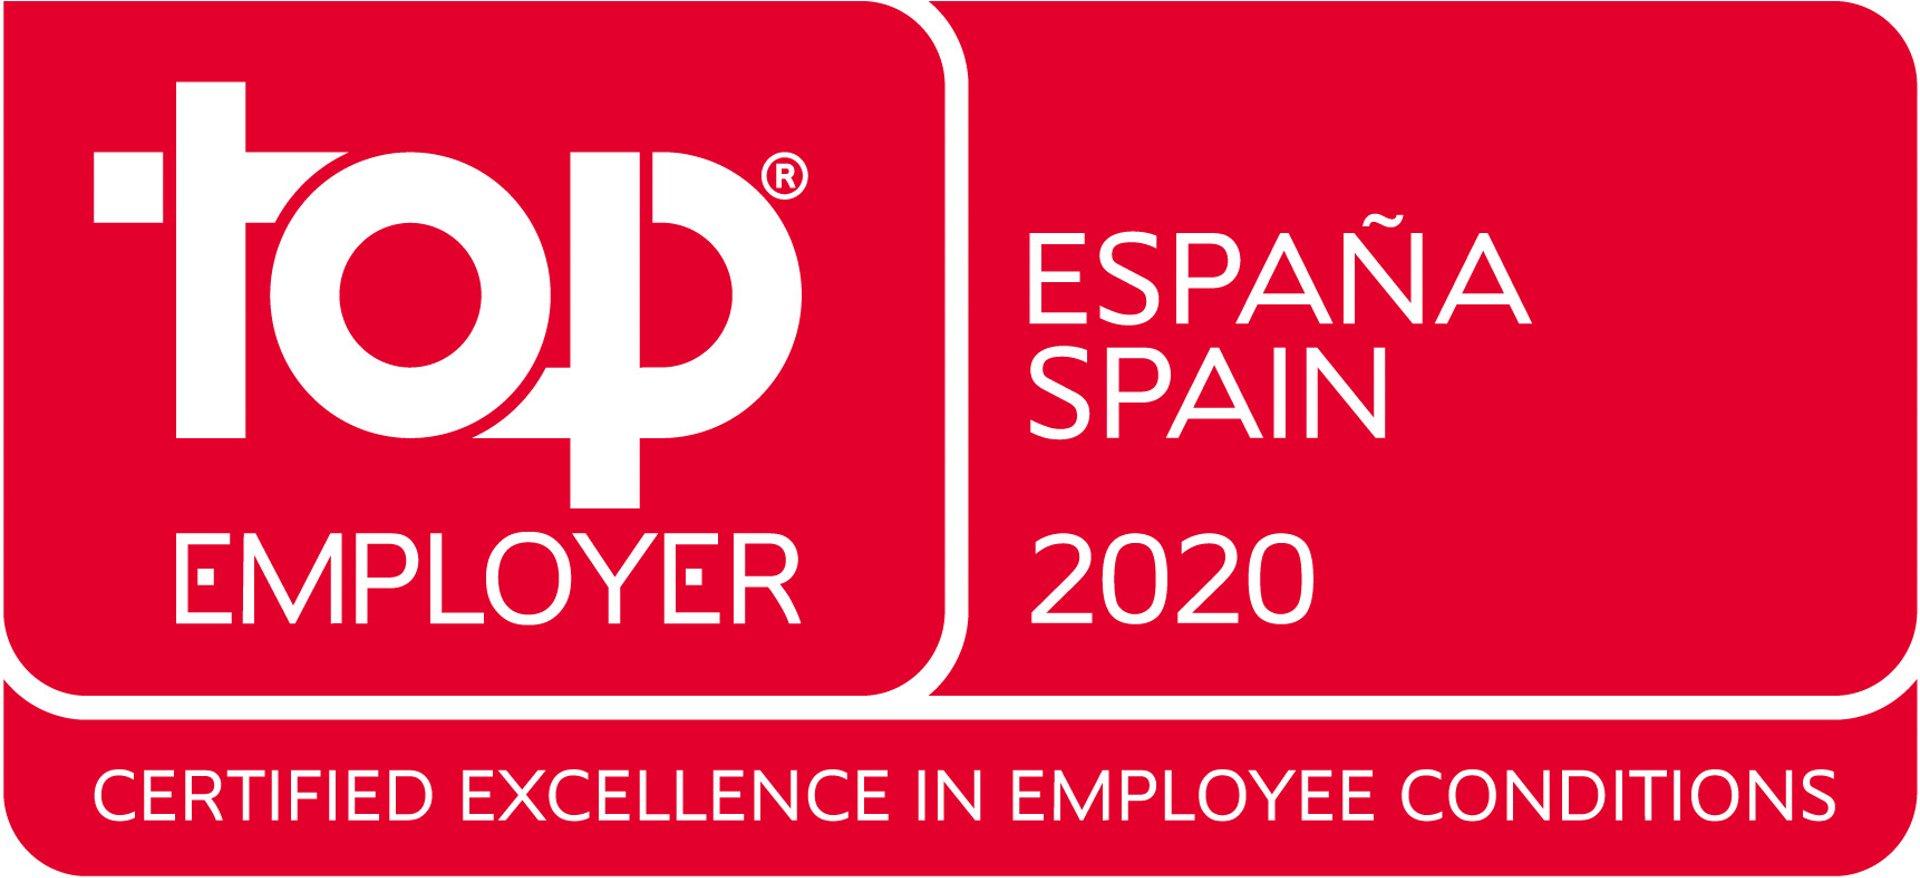 Airbus Top Employer Spain 2020